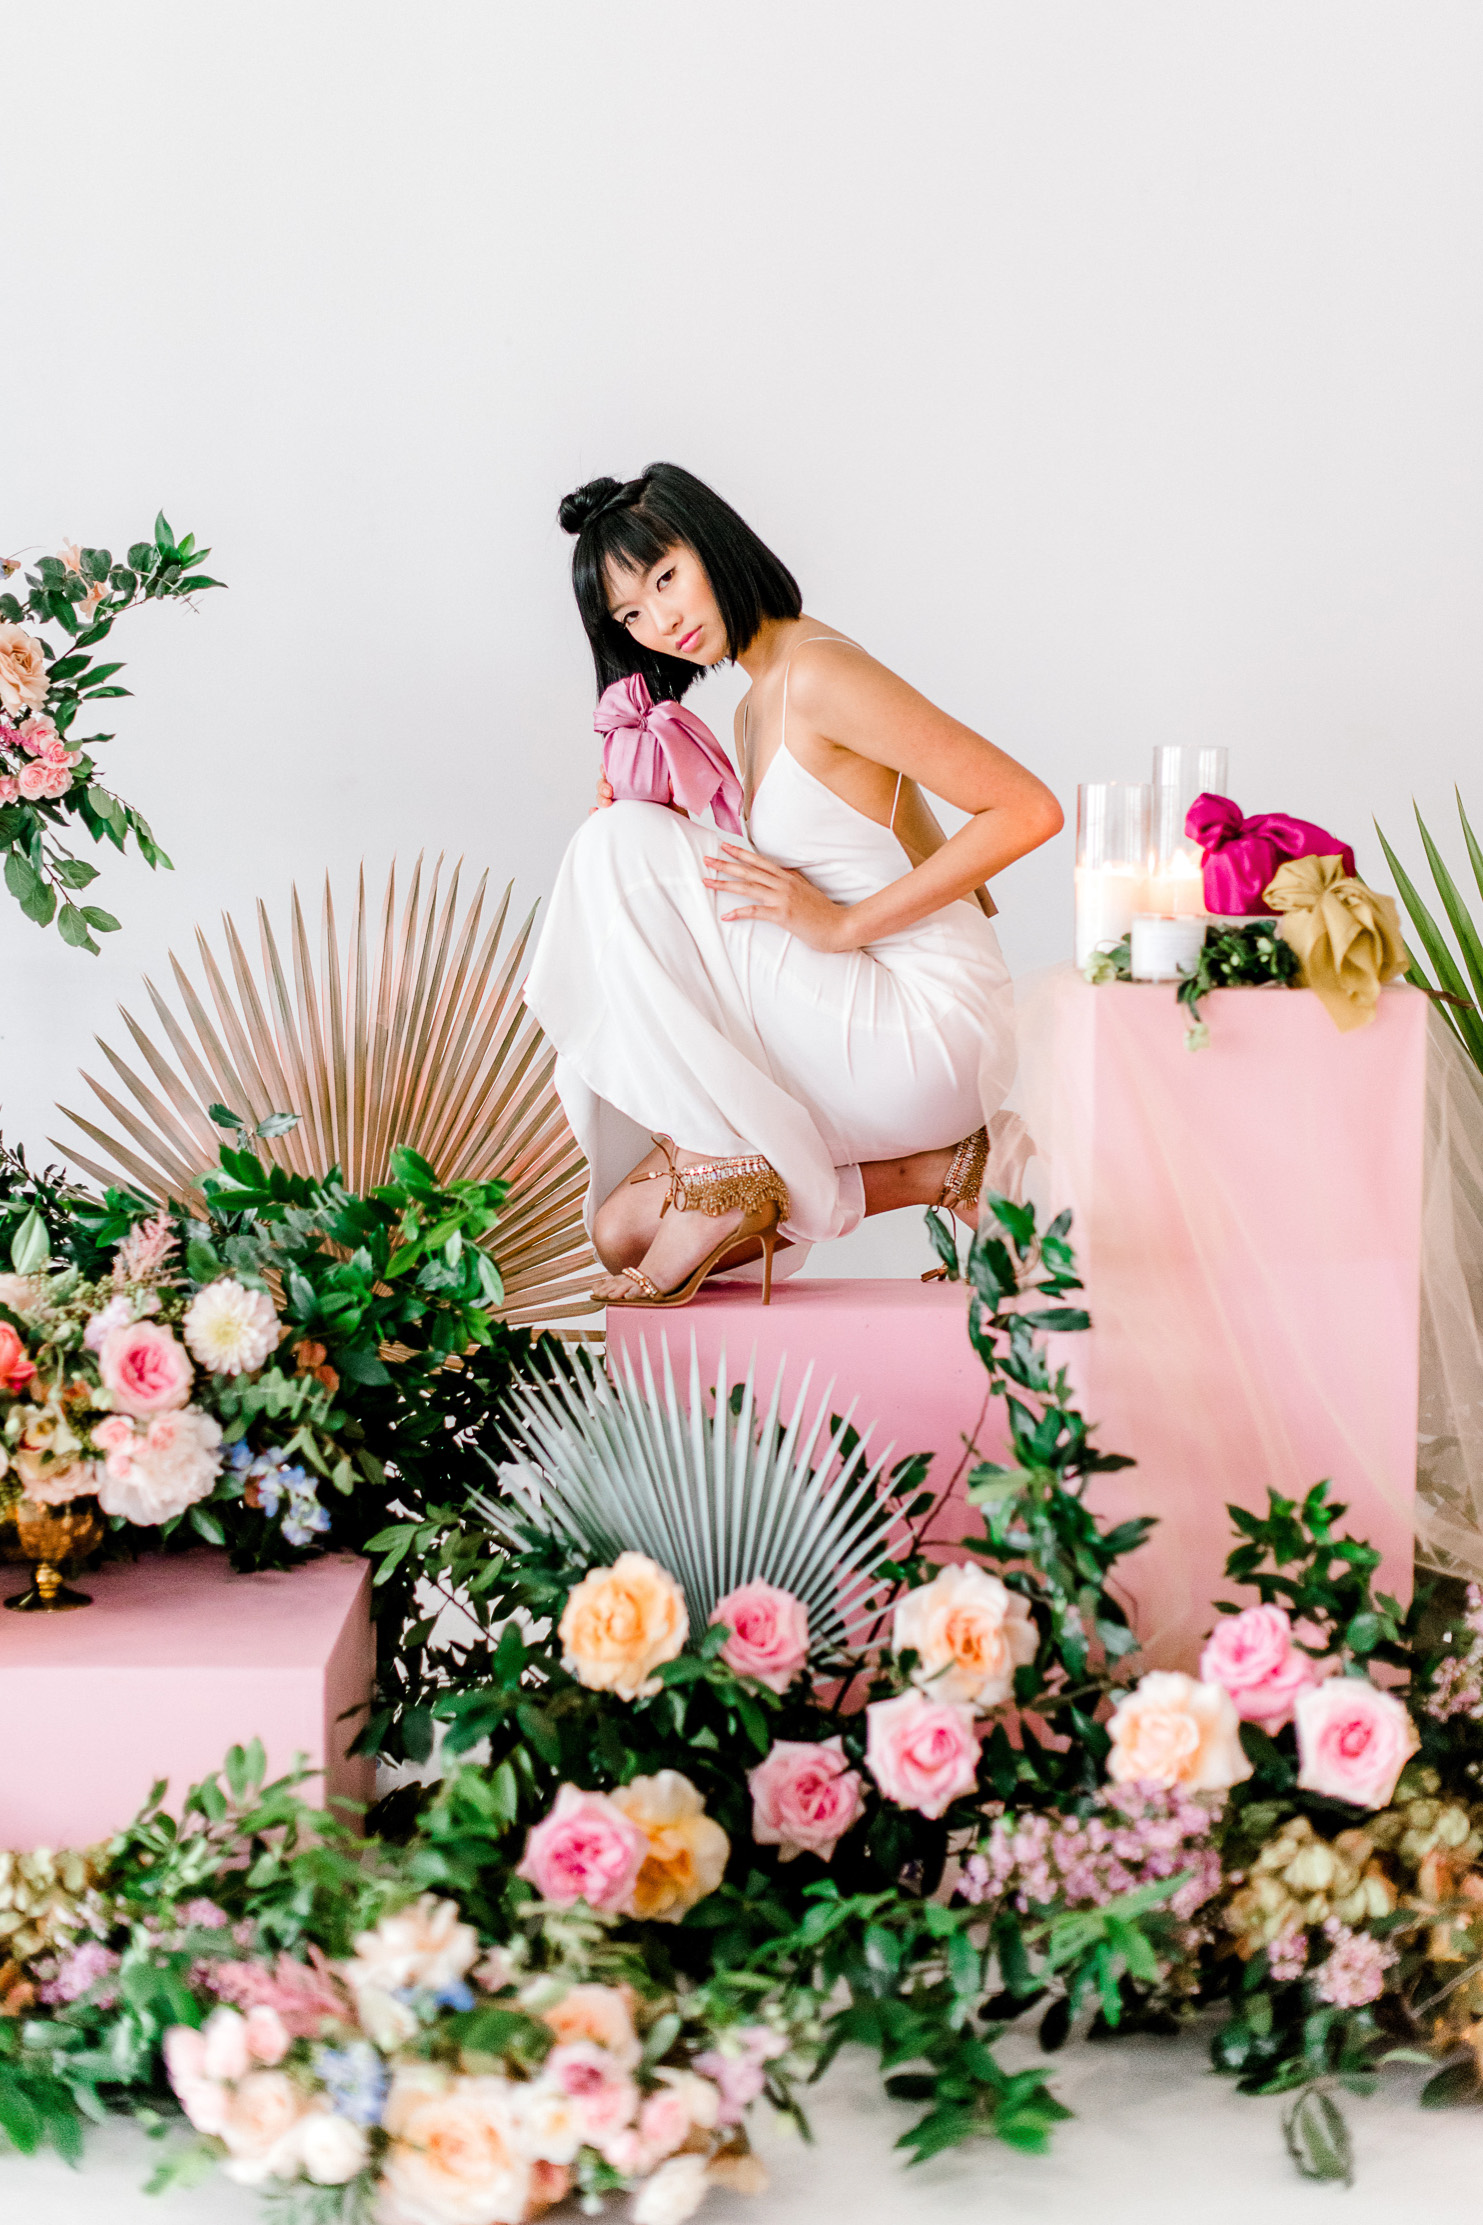 Houston-Wedding-Photographer-Editorial-Fine-Art-Film-Destination-Dallas-Texas-Mibellarosa-Josh-Dana-Fernandez-Photography-217.jpg